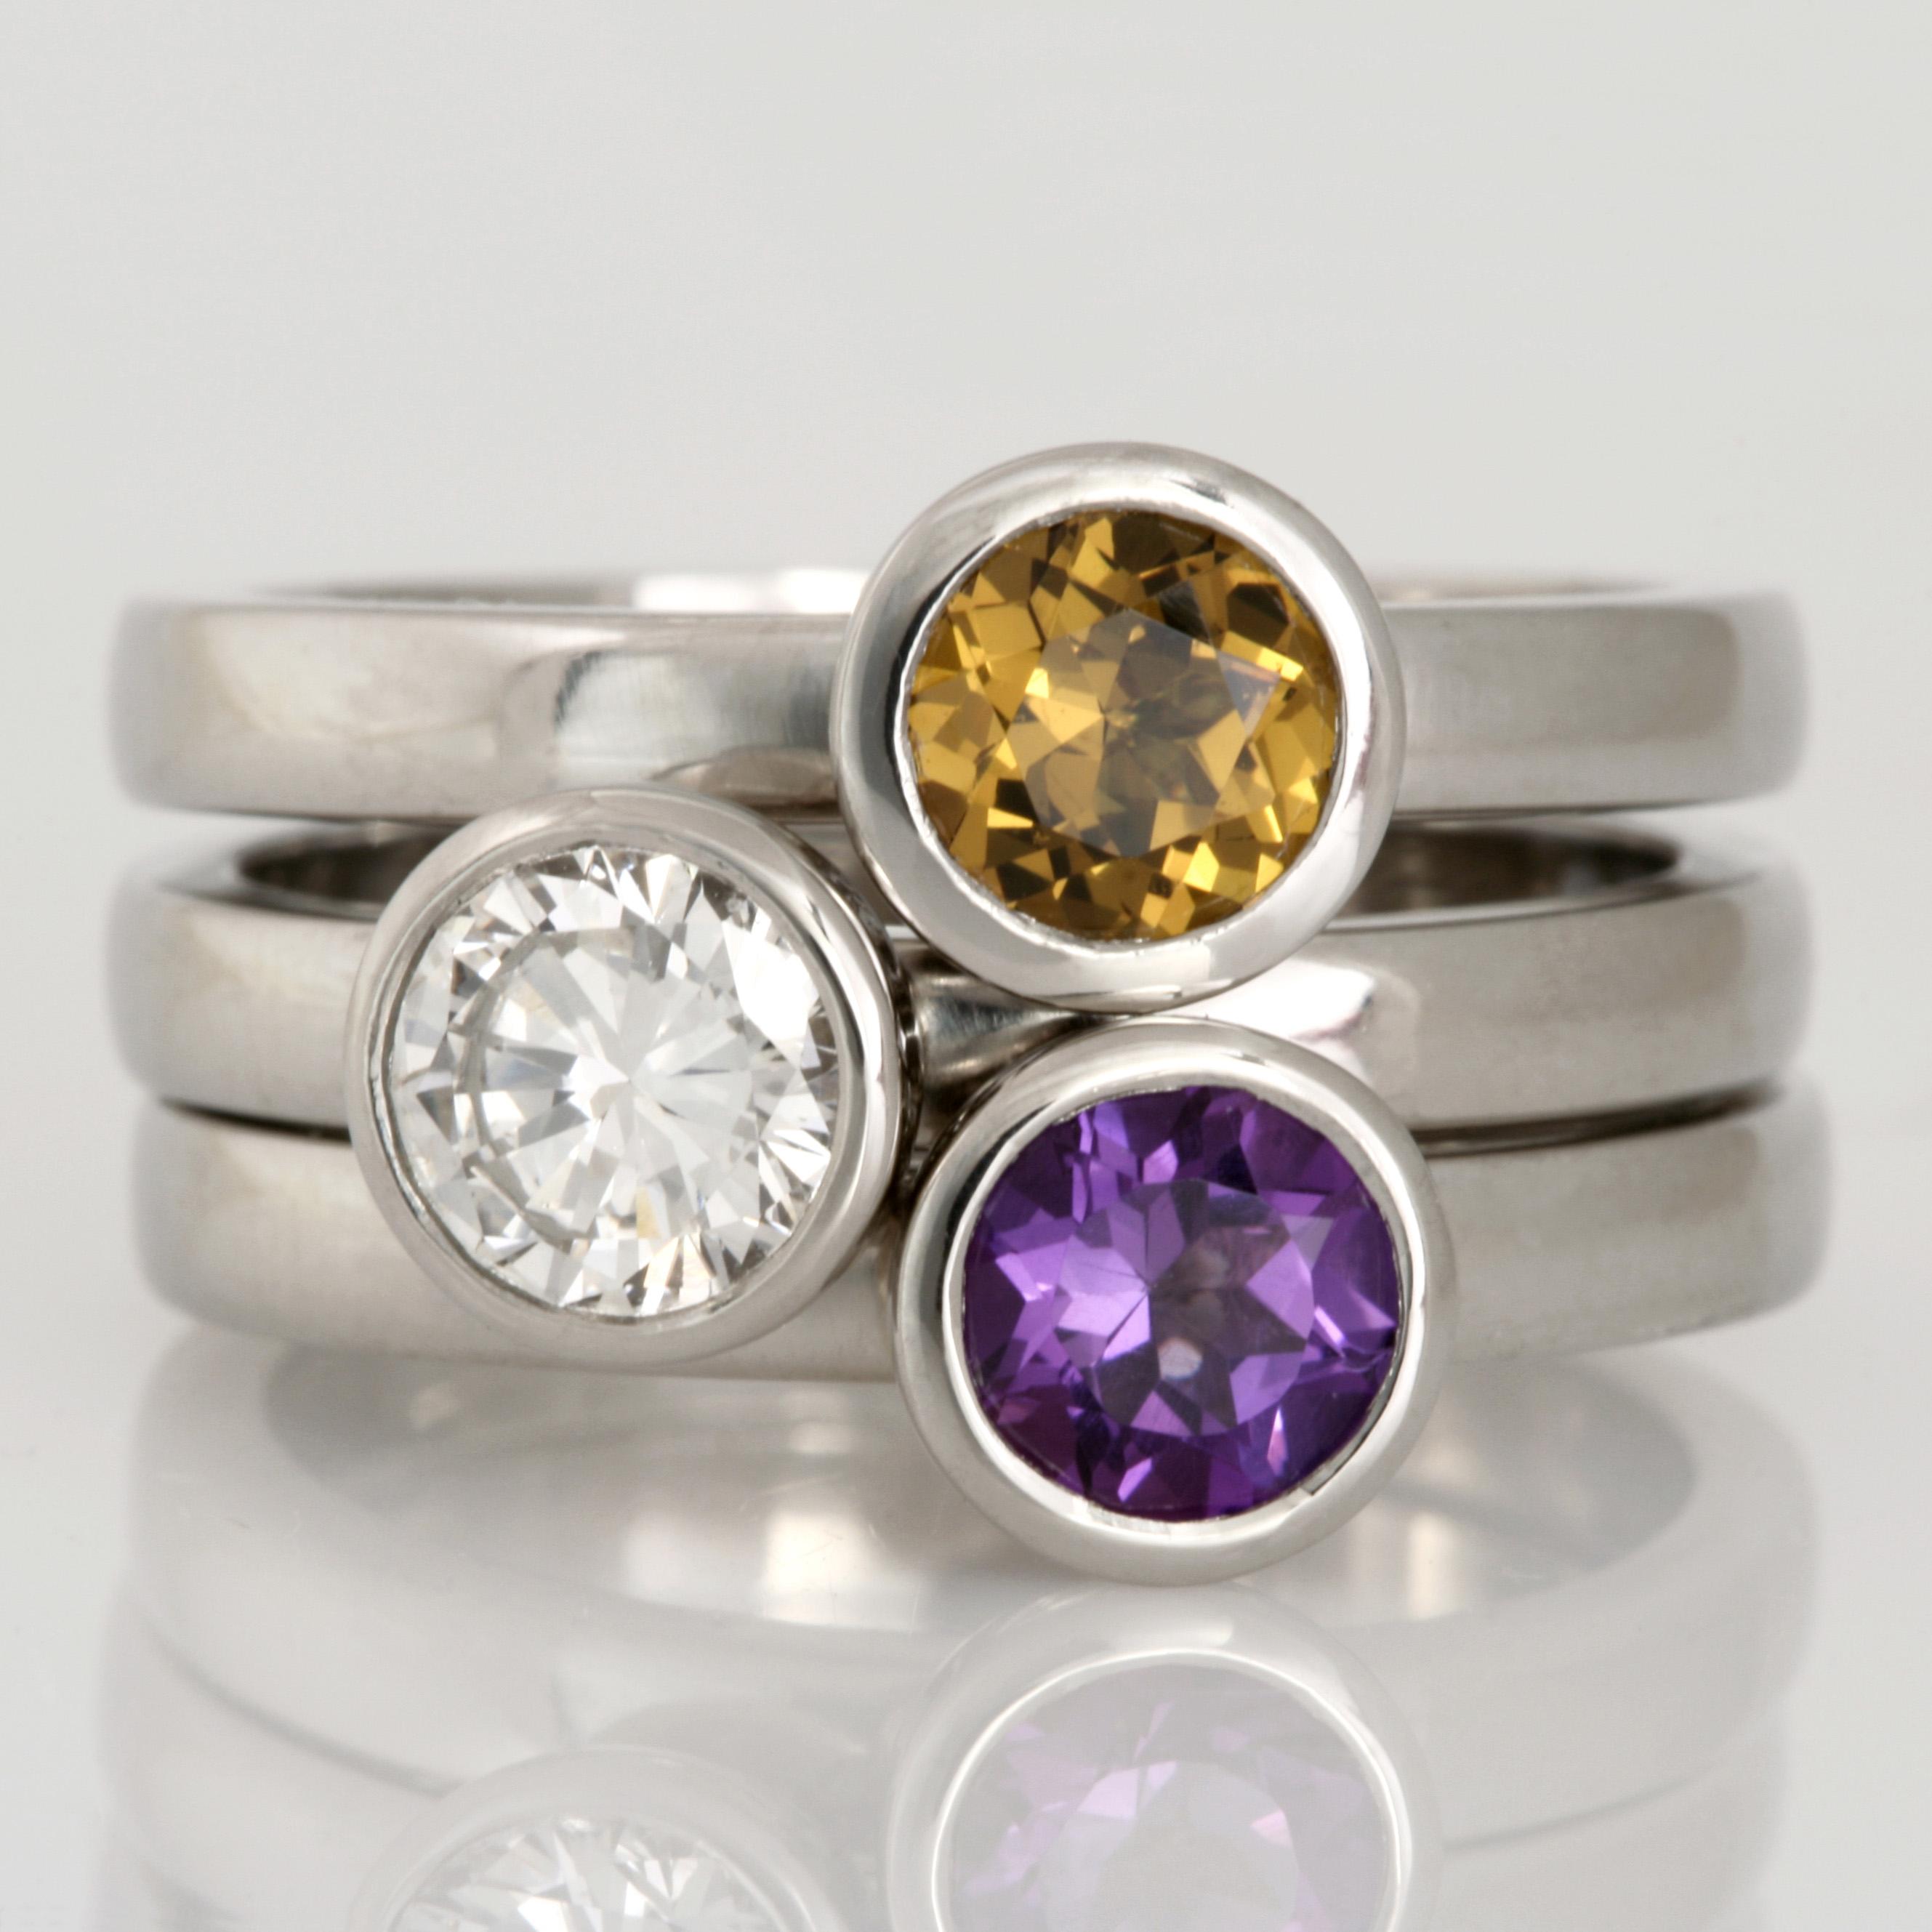 Three handmade ladies palladium stacker rings featuring an amethyst, diamond and Mali garnet